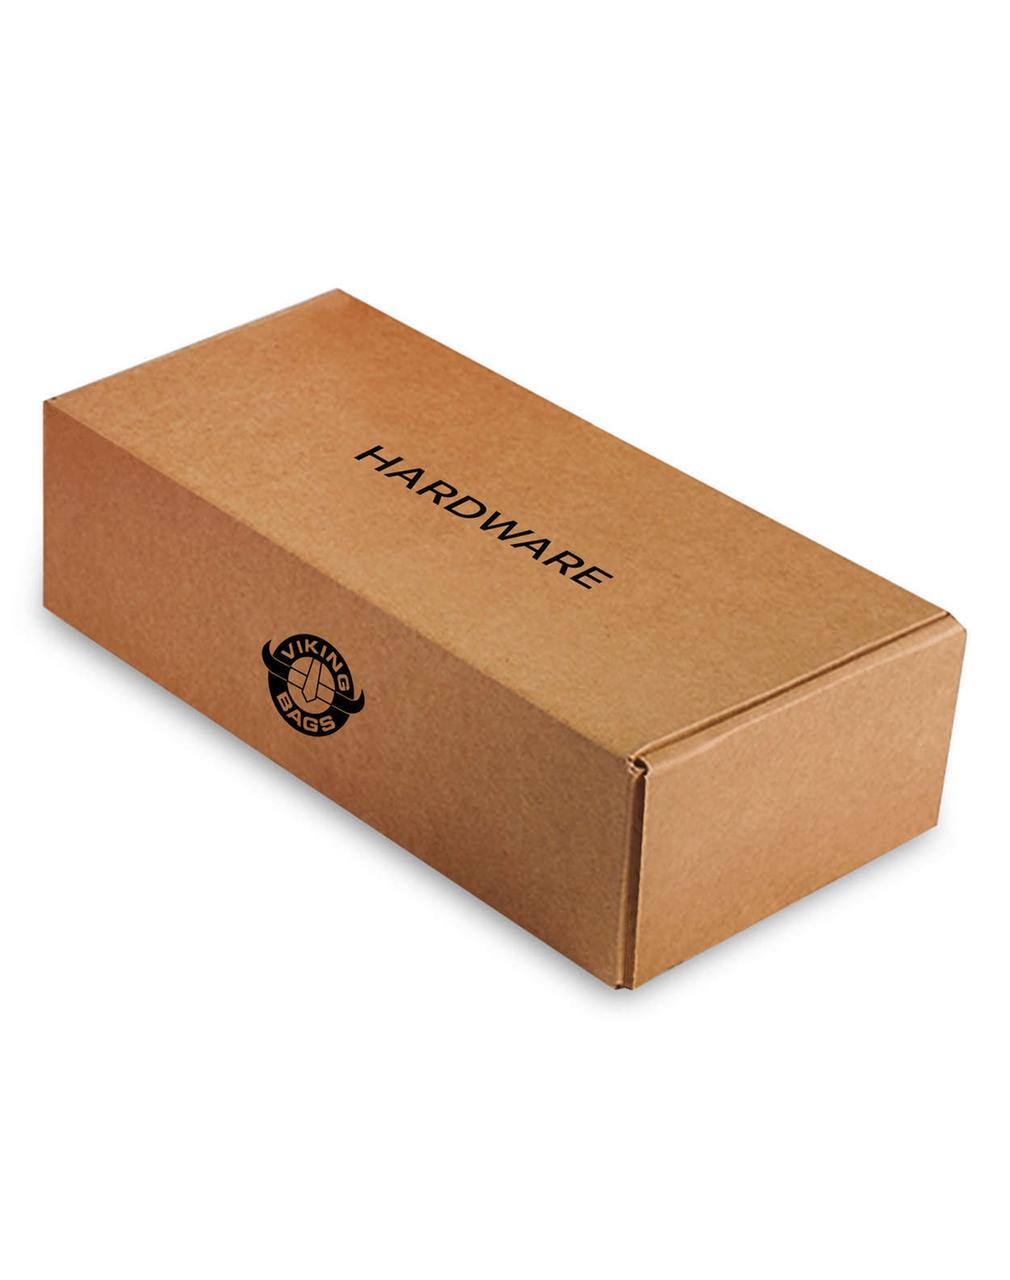 Honda 1500 Valkyrie Interstate Warrior Slanted Medium Motorcycle Saddlebags Hardware Box